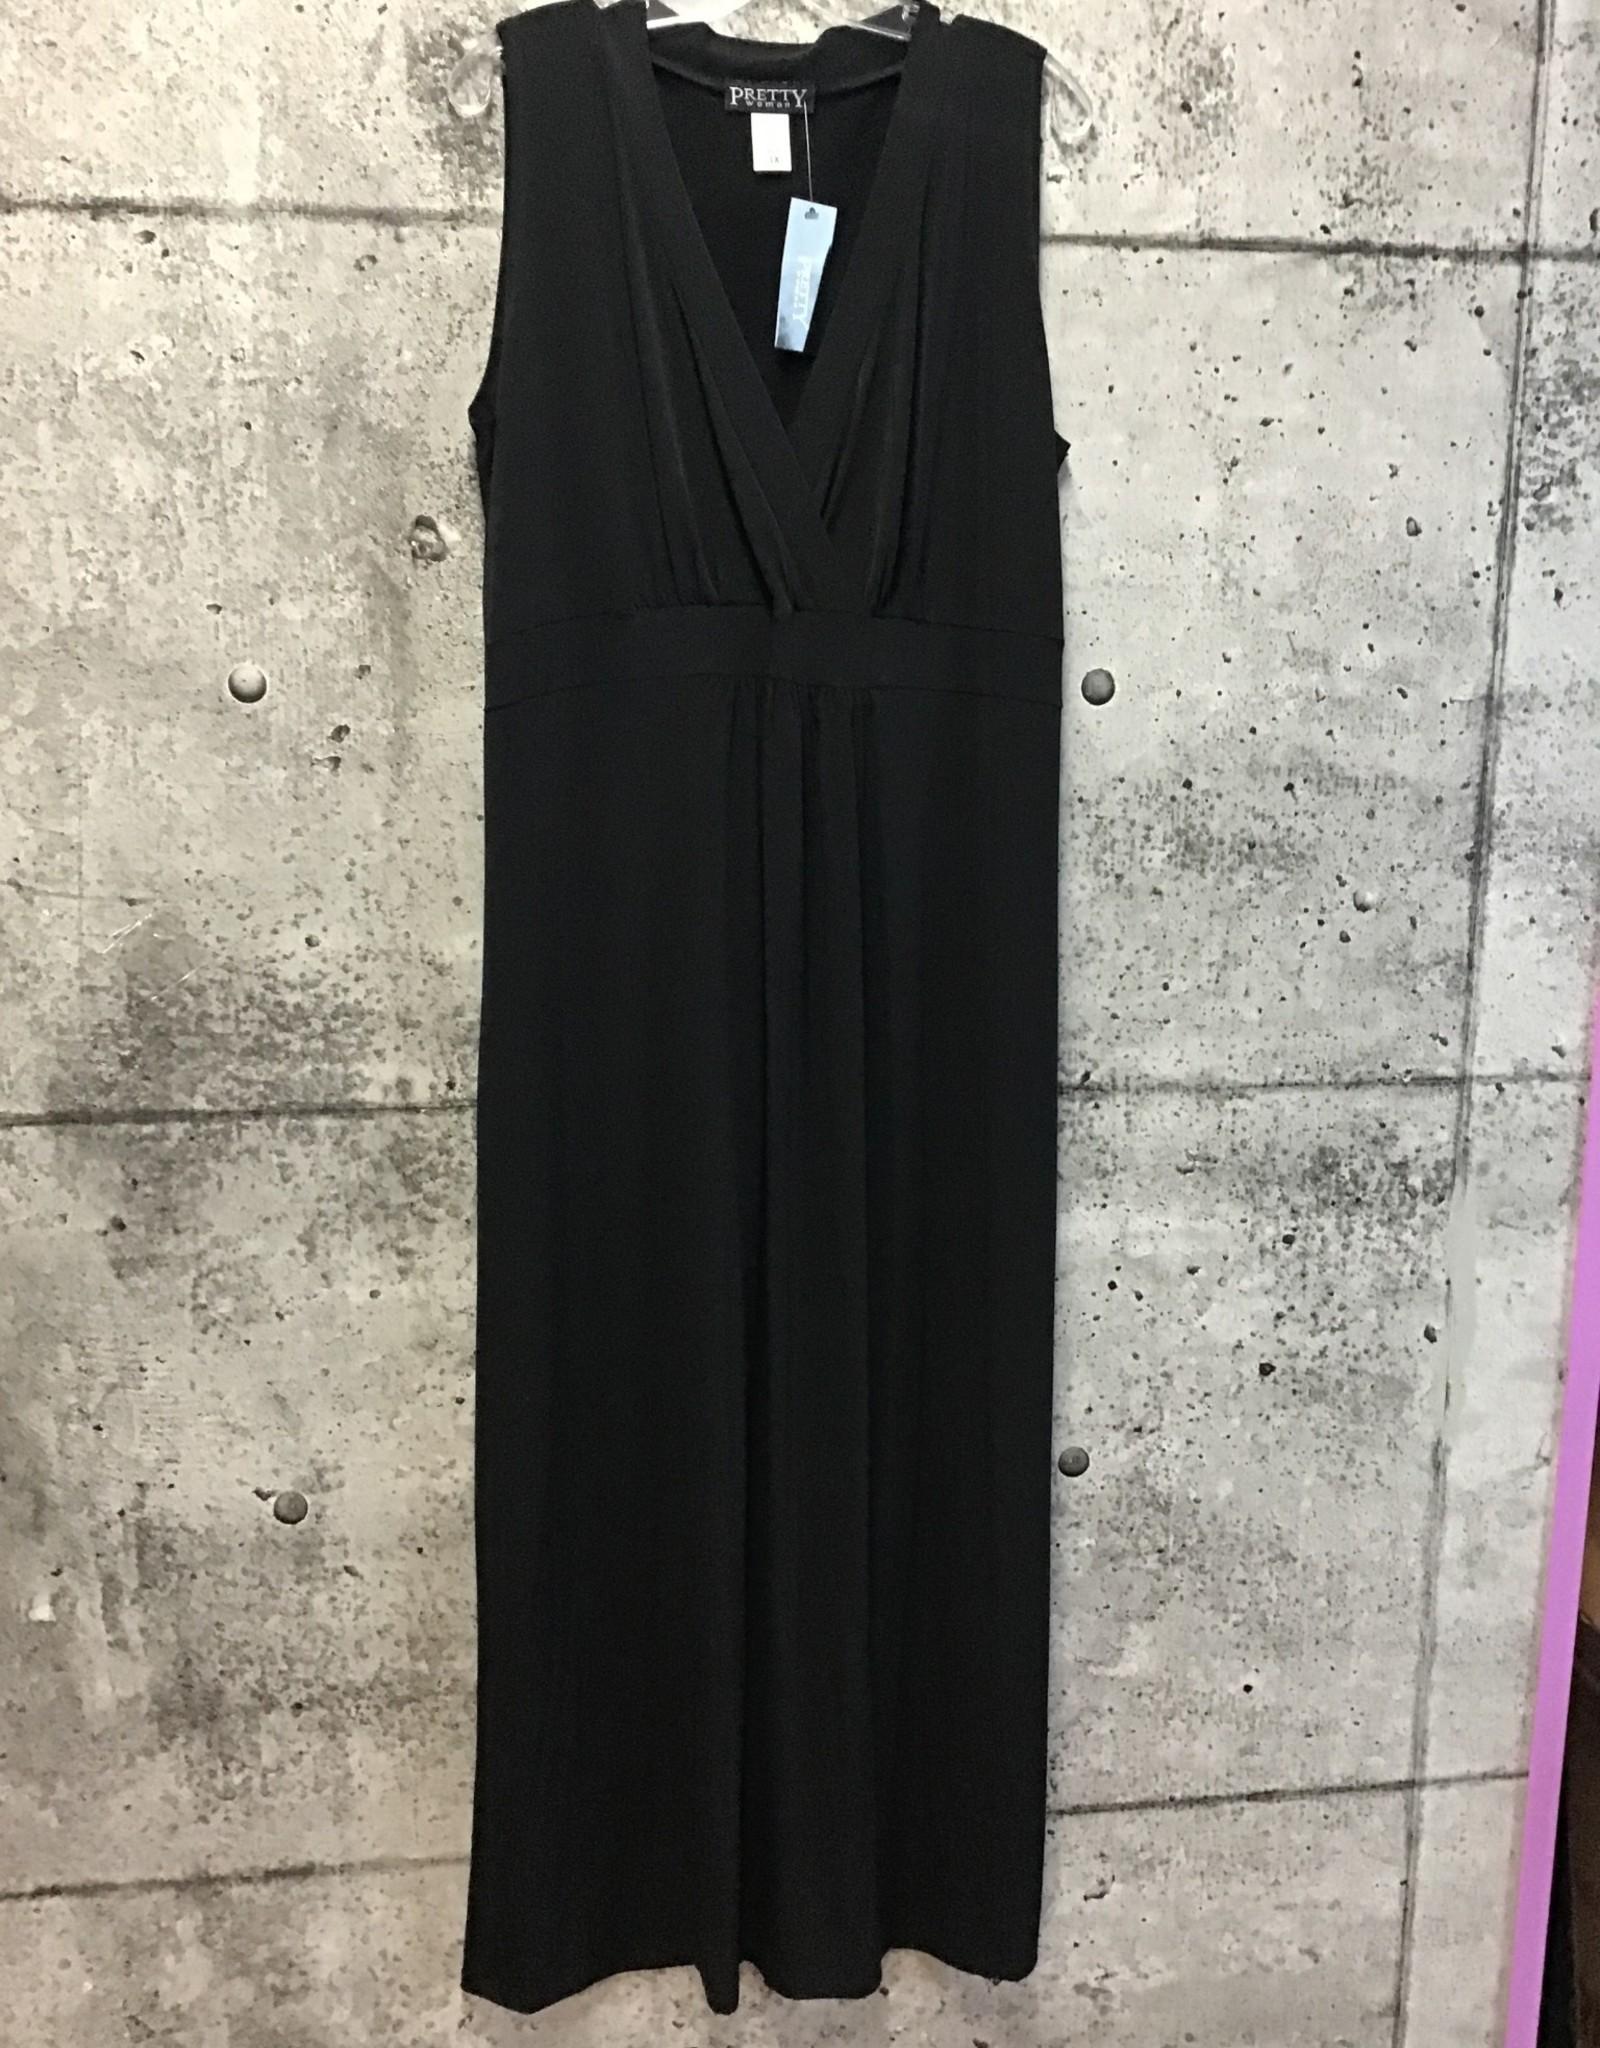 PRETTY WOMEN 713 MAXI DRESS